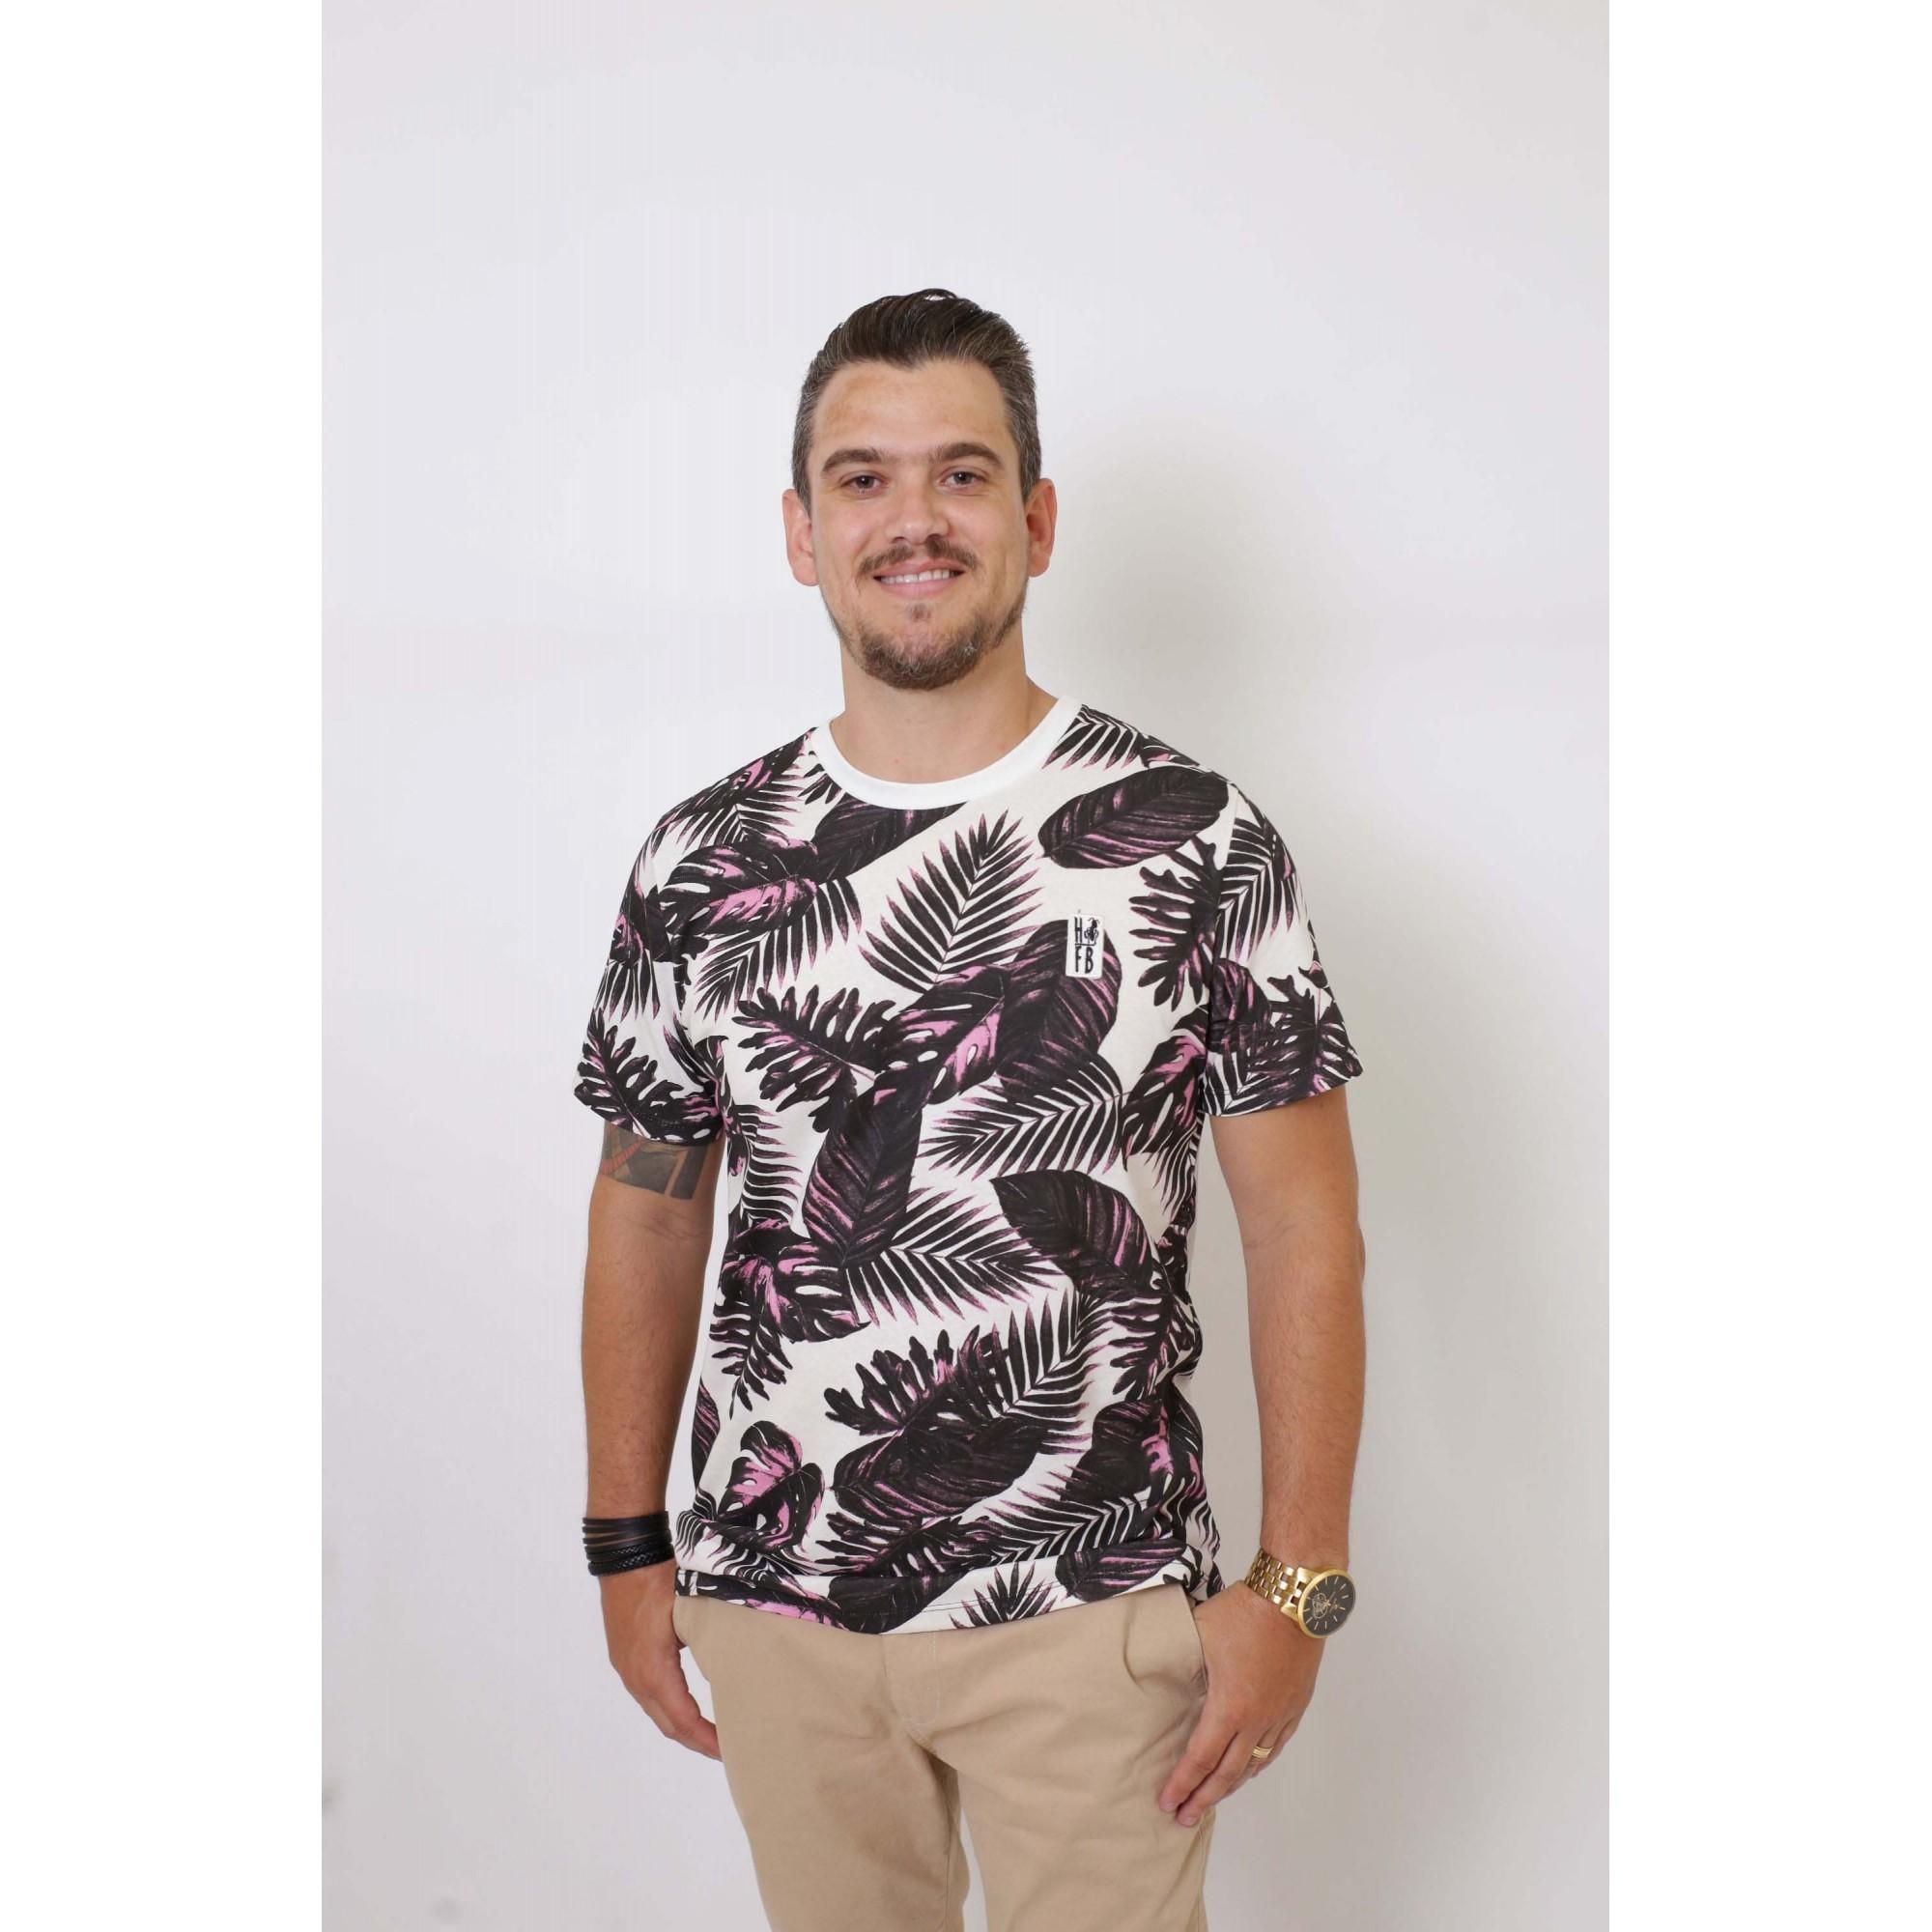 PAI E FILHO > 02 T-Shirts - Cancún [Coleção Tal Pai Tal Filho]  - Heitor Fashion Brazil